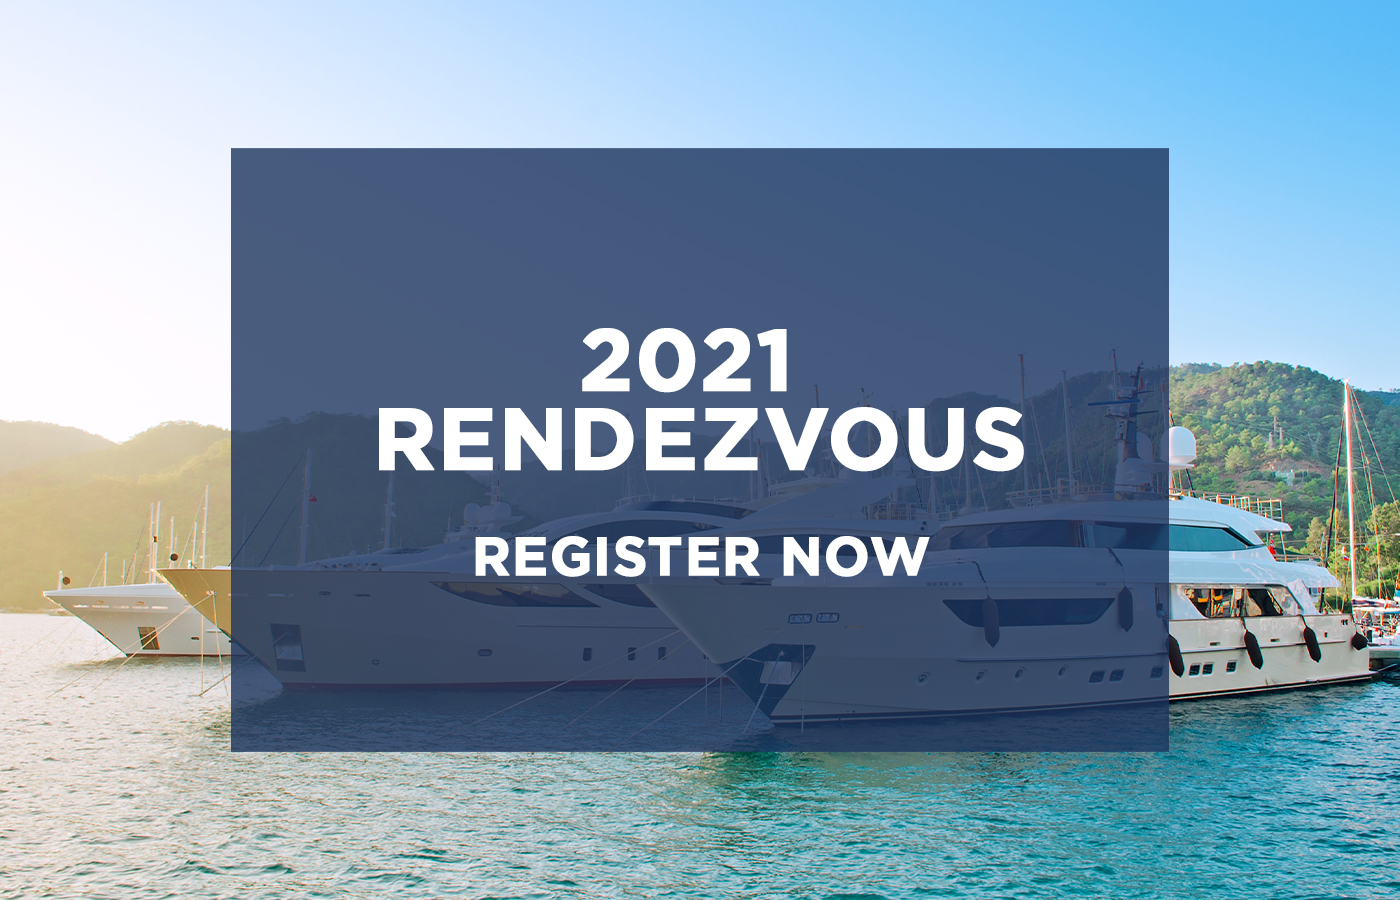 Denison 2021 Rendezvous Registration